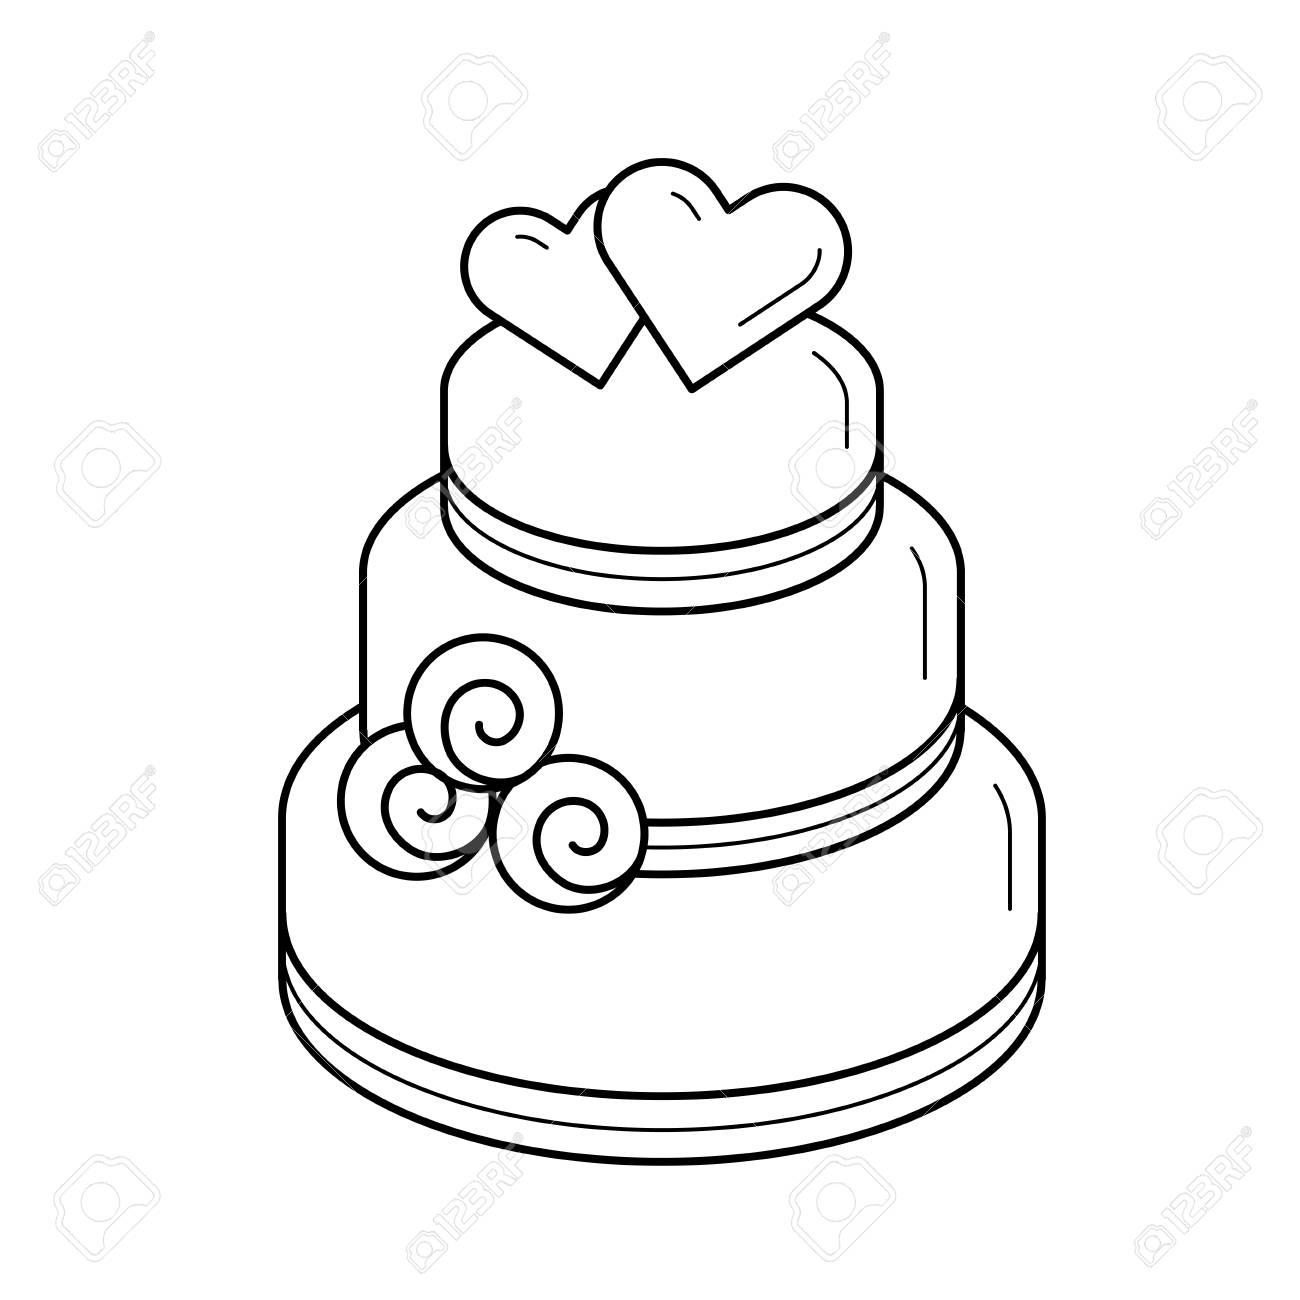 Wedding Cake Vector Line Icon Isolated On White Background Layered